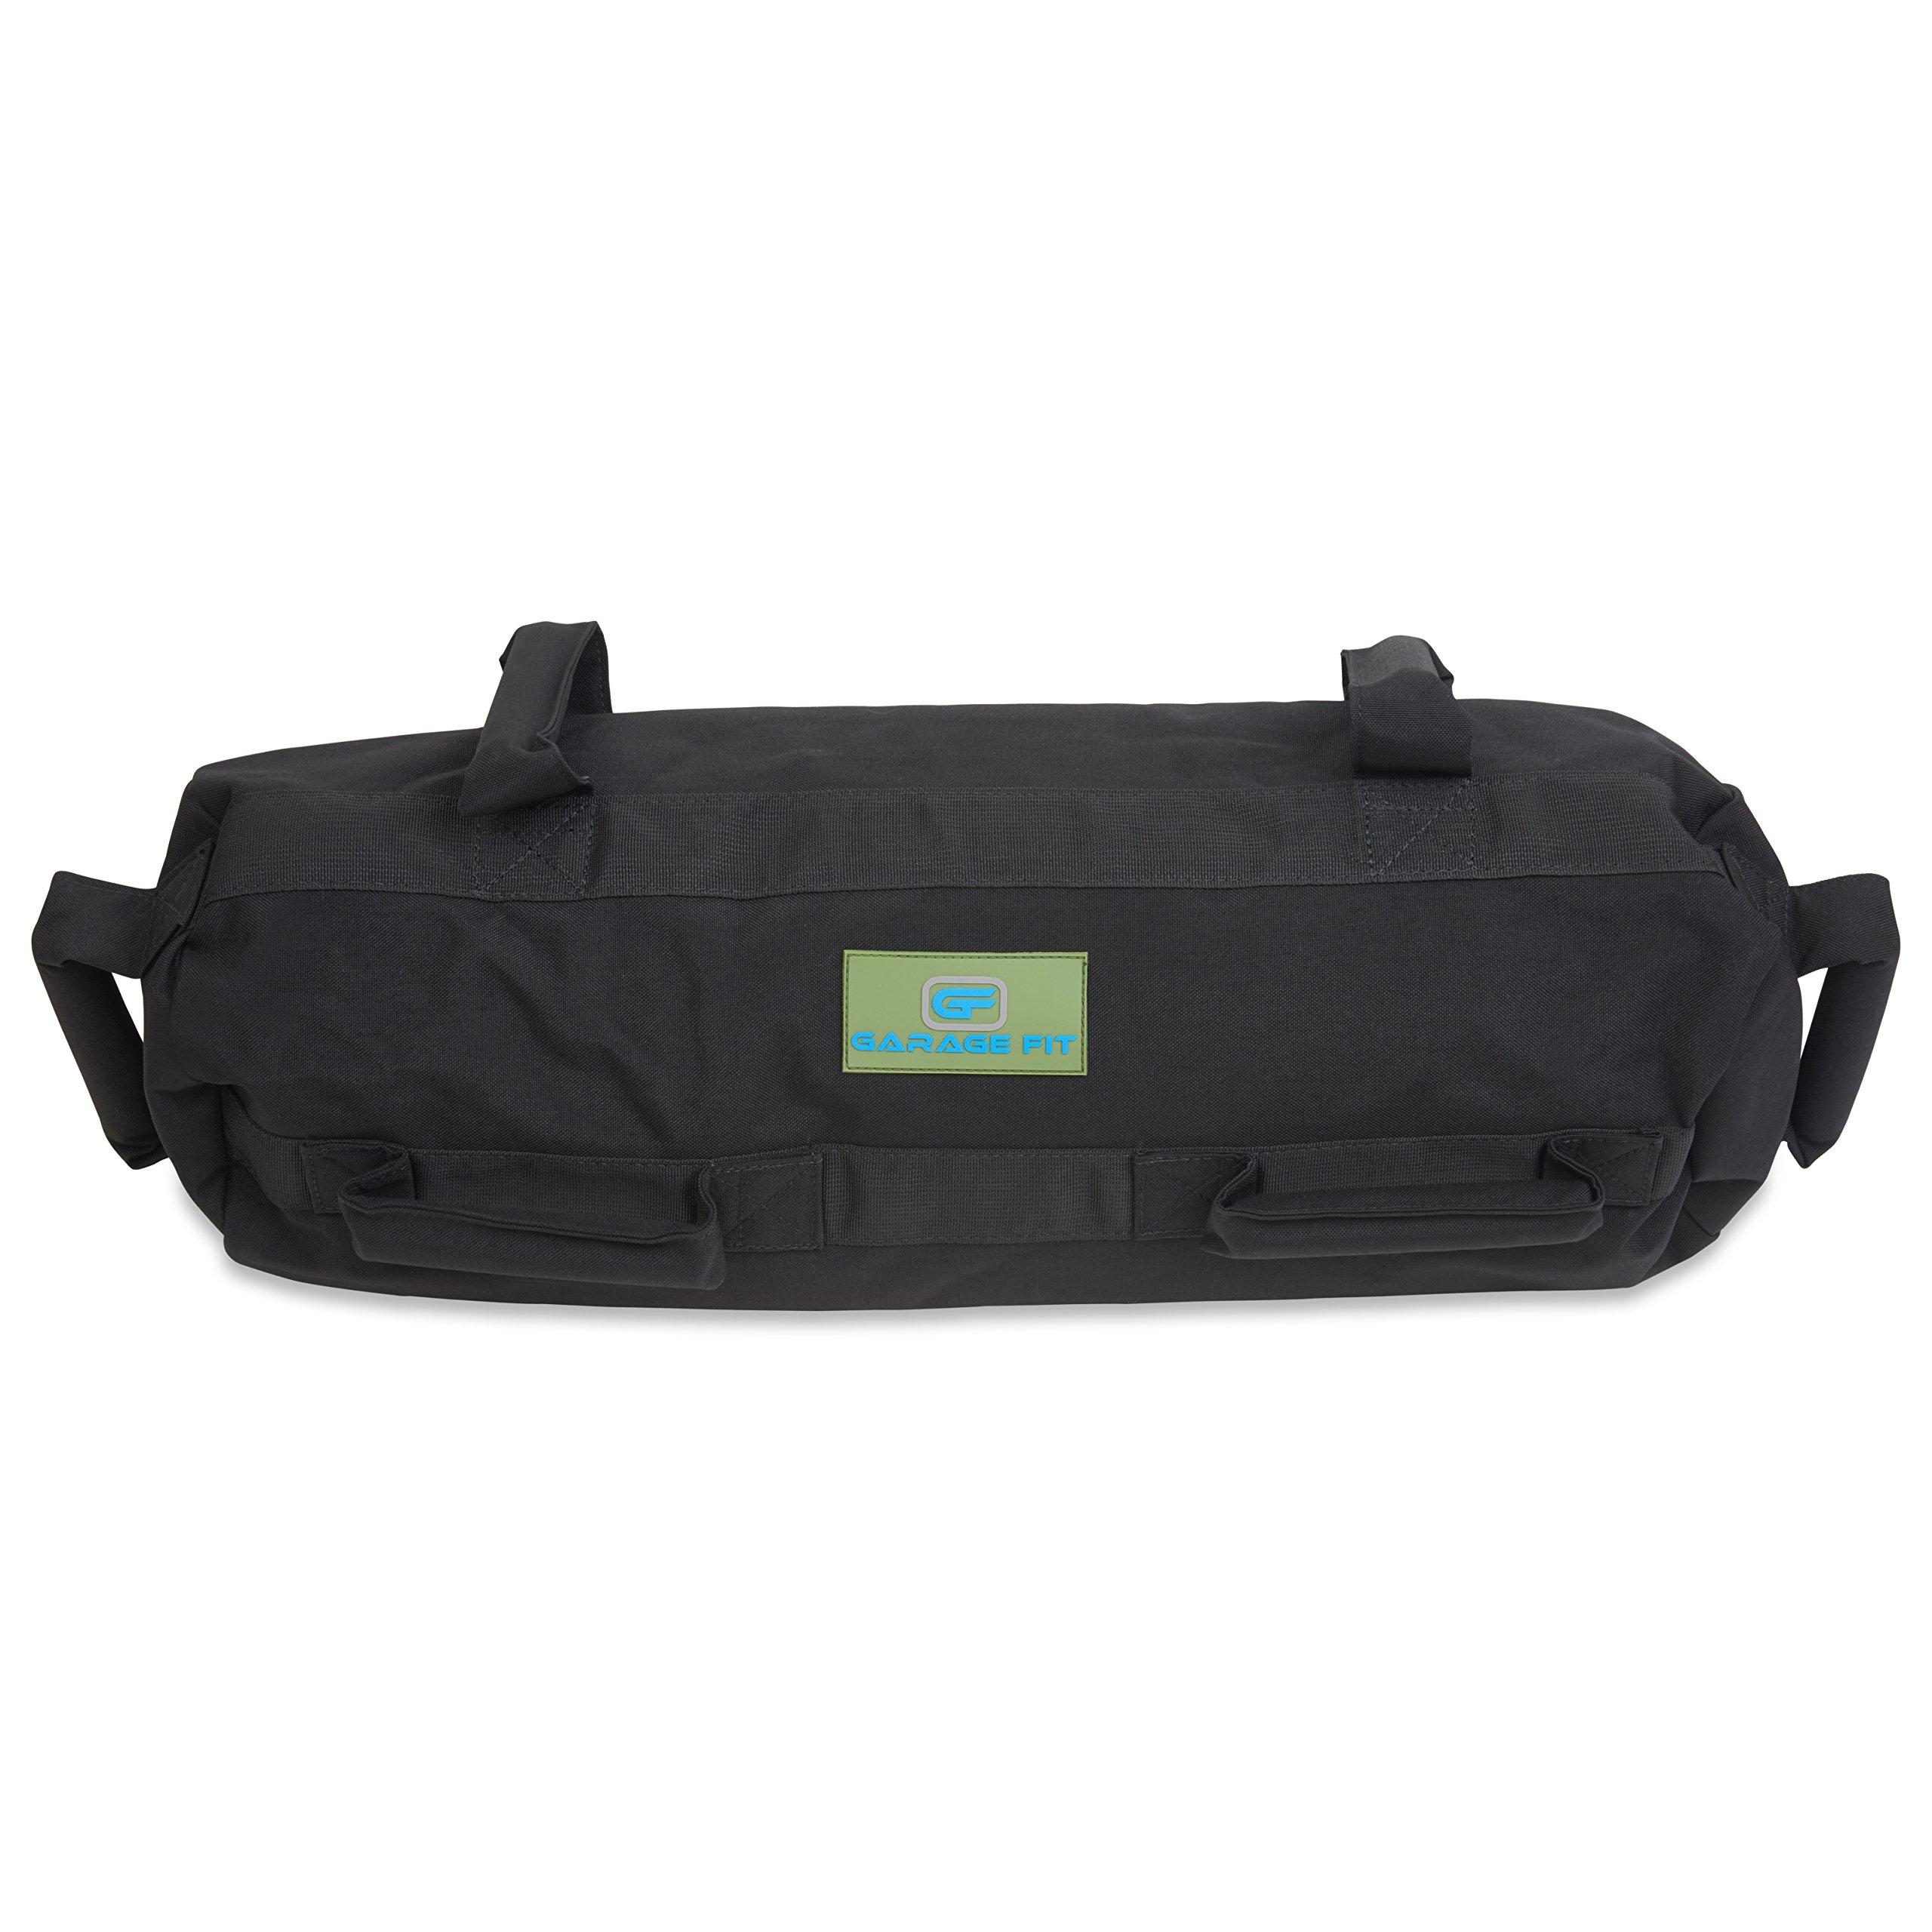 Garage Fit Heavy Duty Workout Sandbags for Fitness, Exercise Sandbags, Military Sandbags, Weighted Bags, Weighted Sandbag, Fitness Sandbags, Training Sandbags (Black Rubber Core Handle, 20-60 lbs)